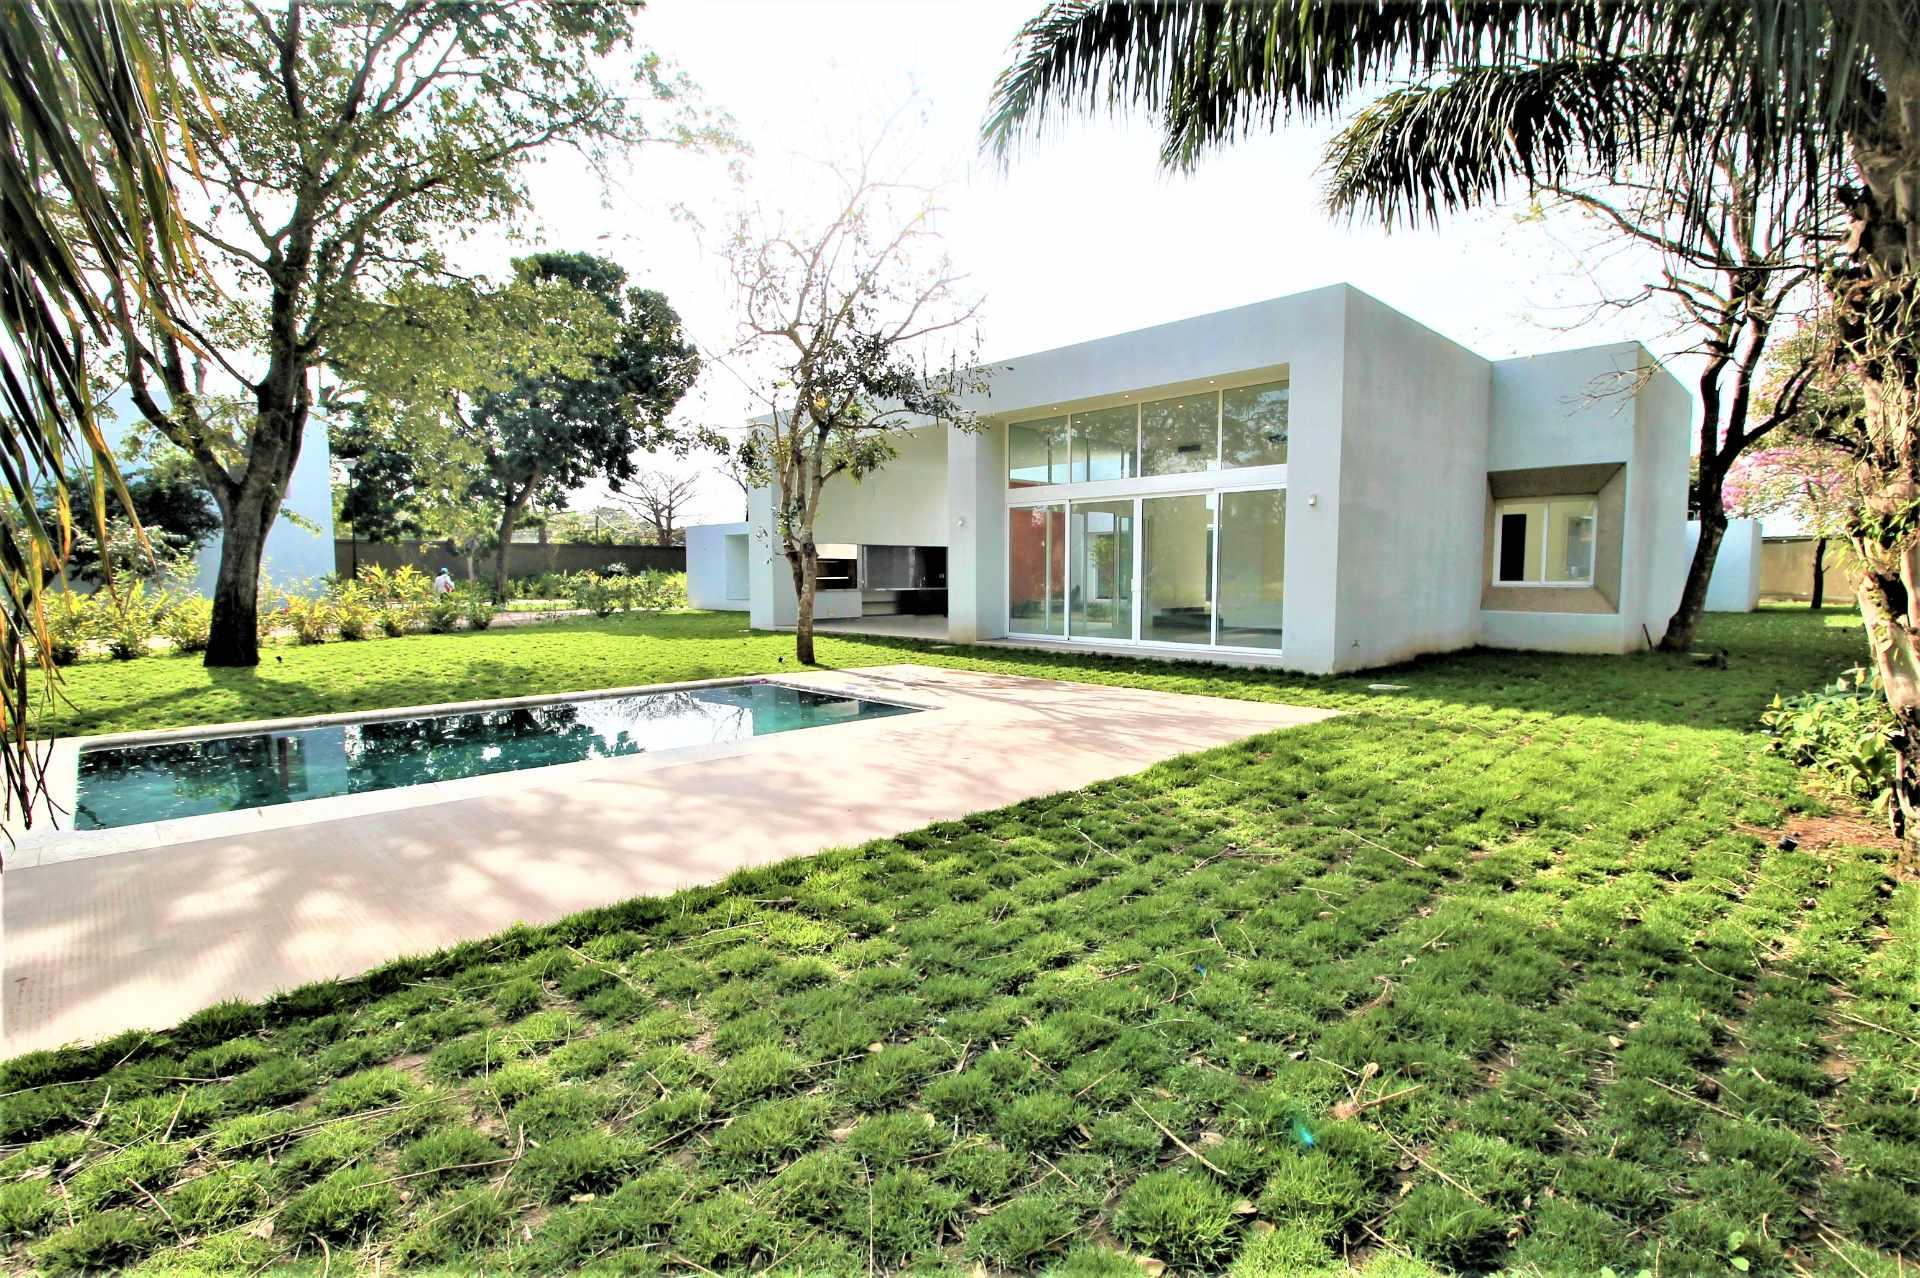 Casa en Alquiler Av. Pirai 5to Anillo - Condominio Cerrado Foto 6